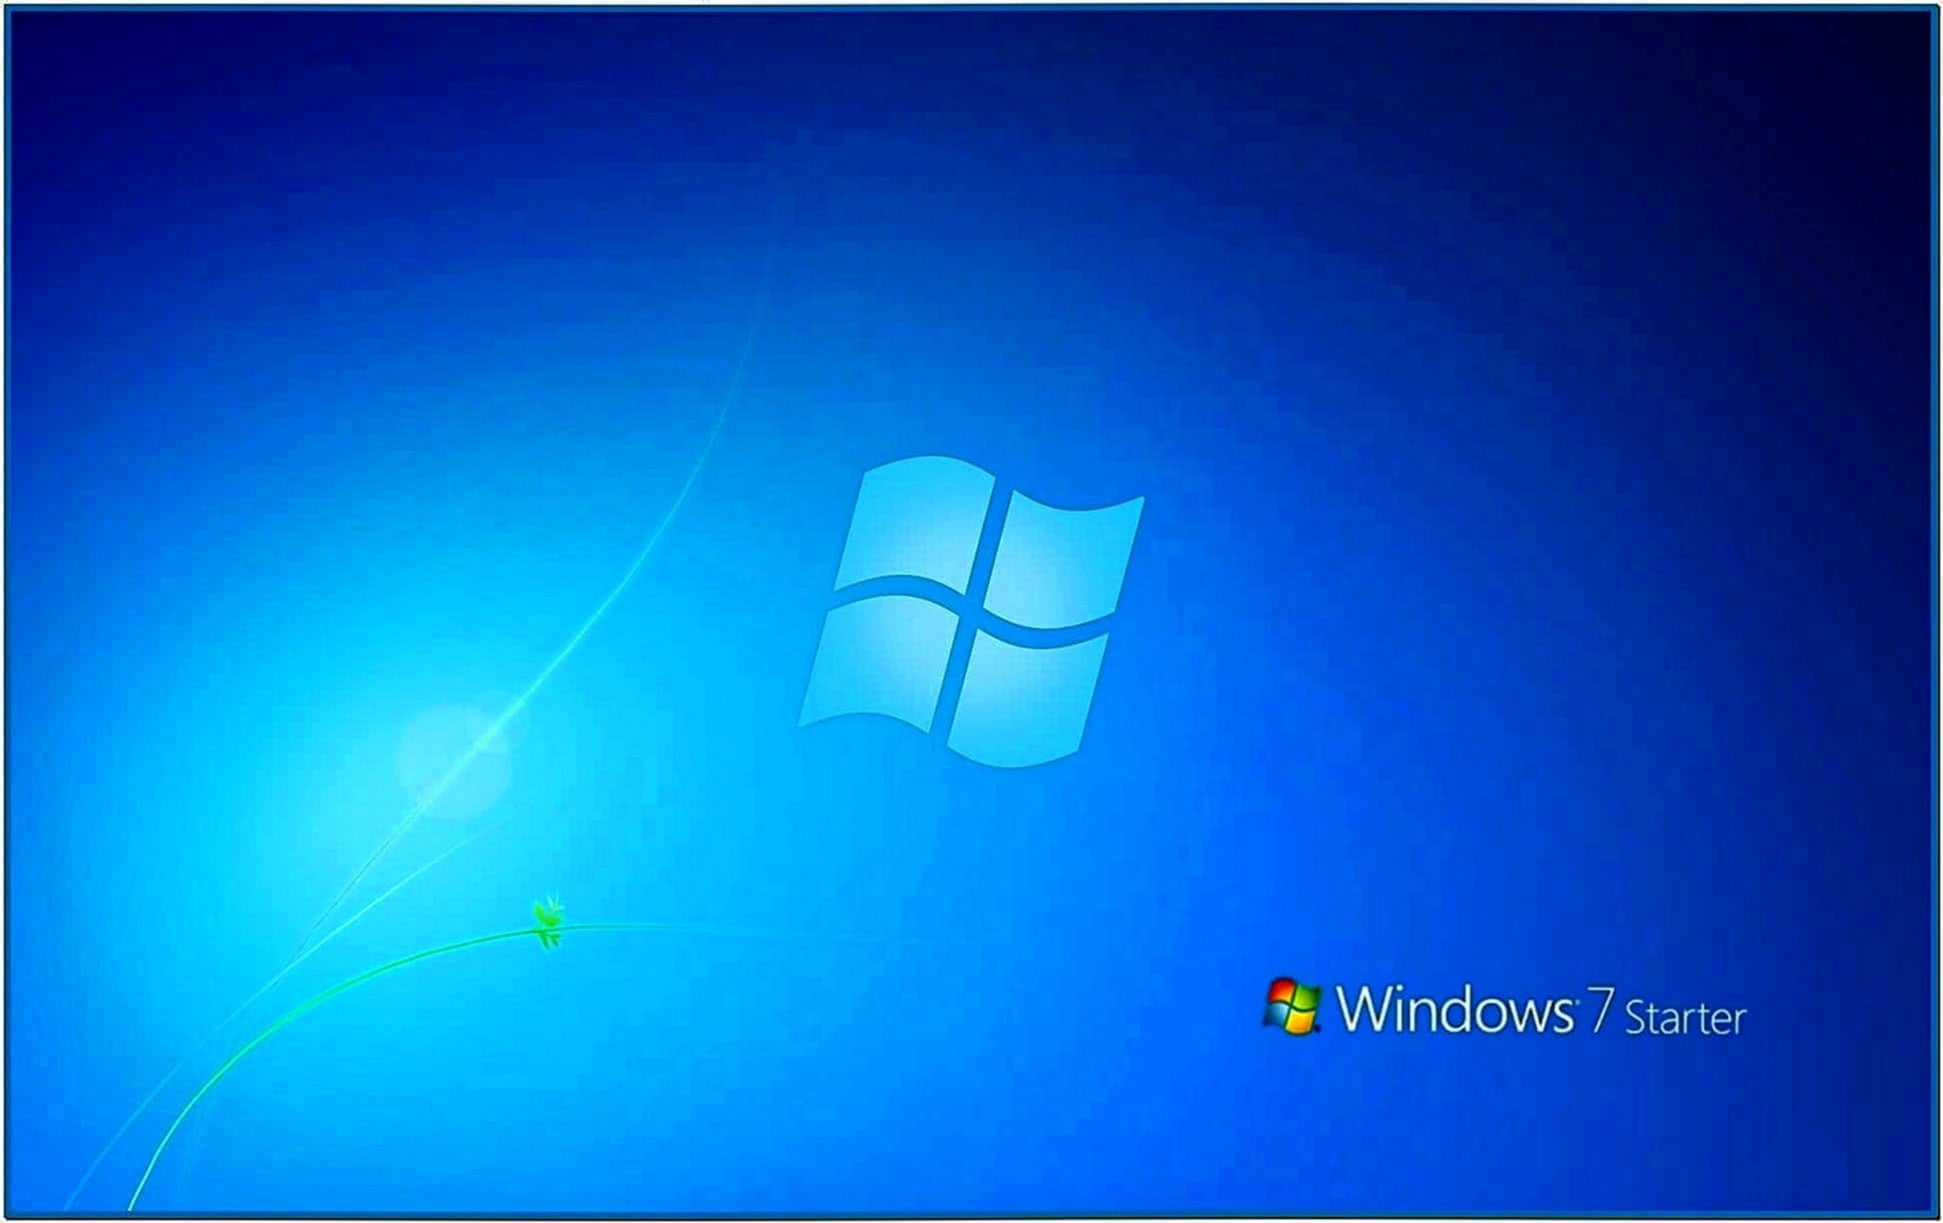 Screensavers Windows 7 Home Basic